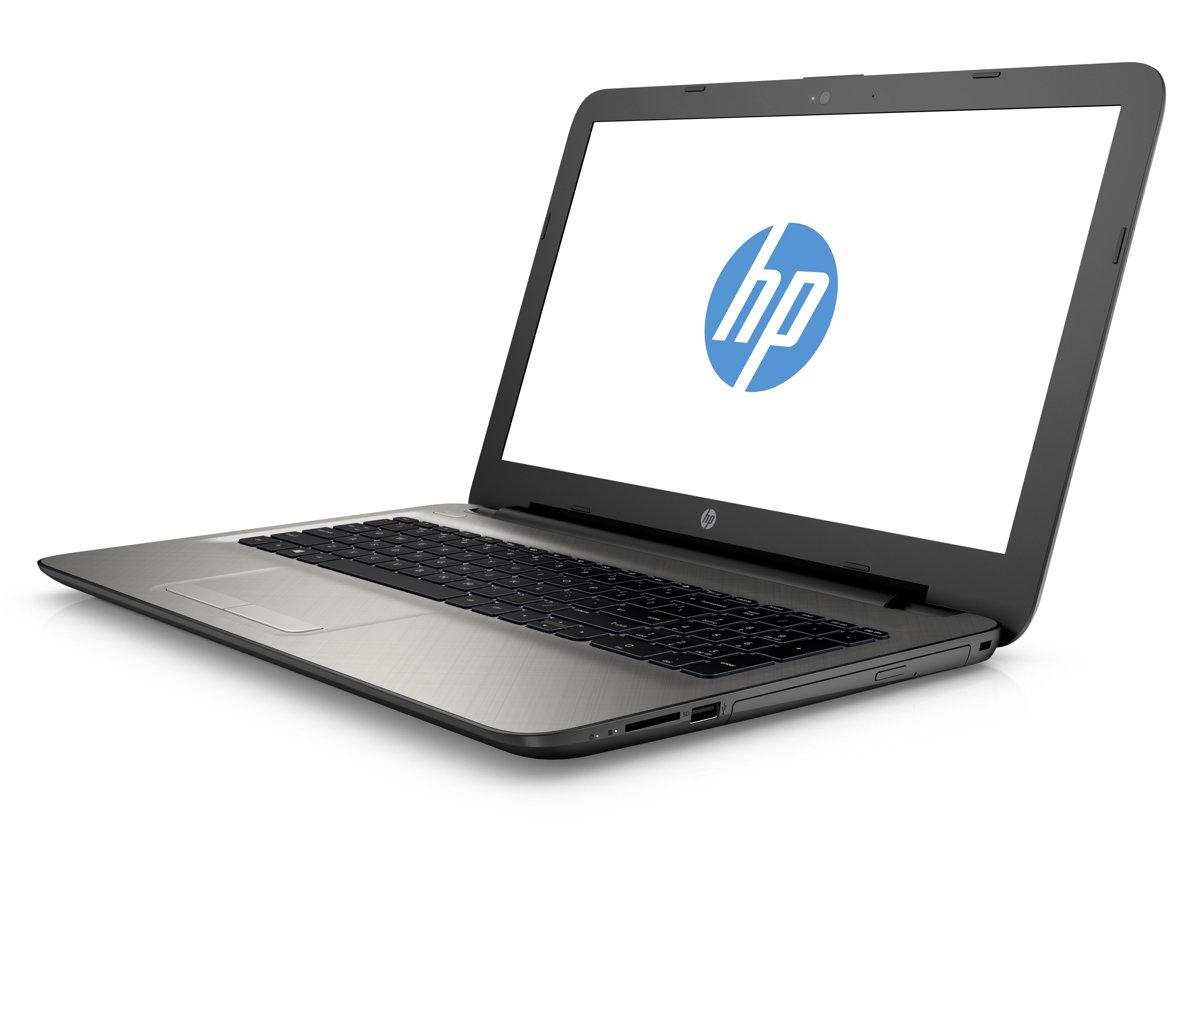 Hp notebook x64-based pc - Hp Laptop 15 6 Screen Intel Pentium Quad Core 6gb Memory 500gb Hard Drive Windows 10 By Office Depot Officemax